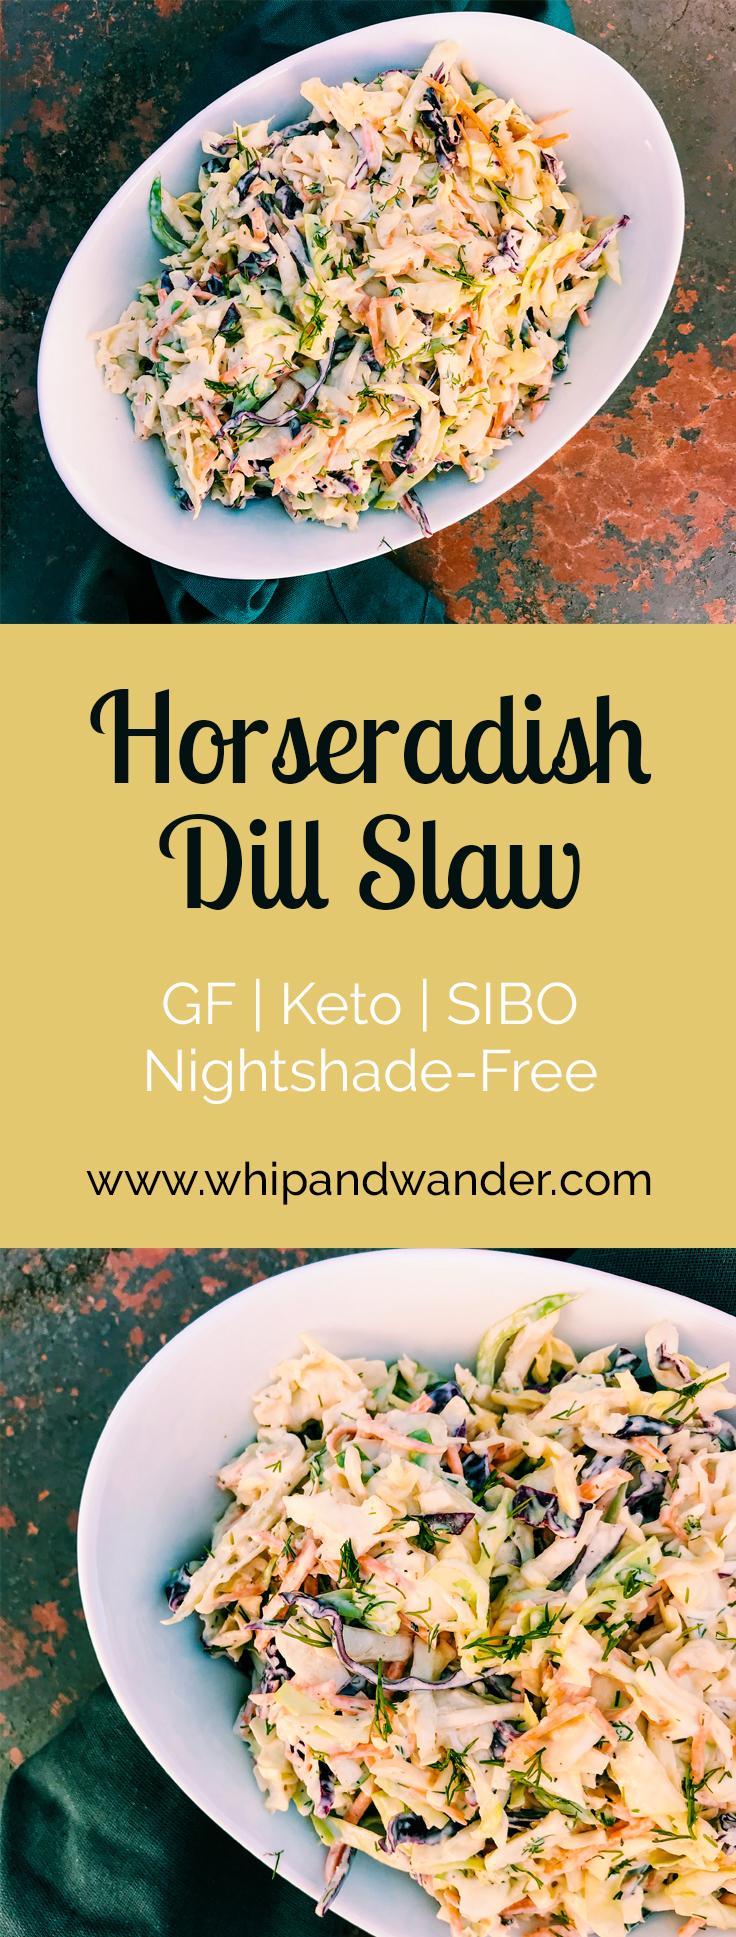 Horseradish Dill Slaw